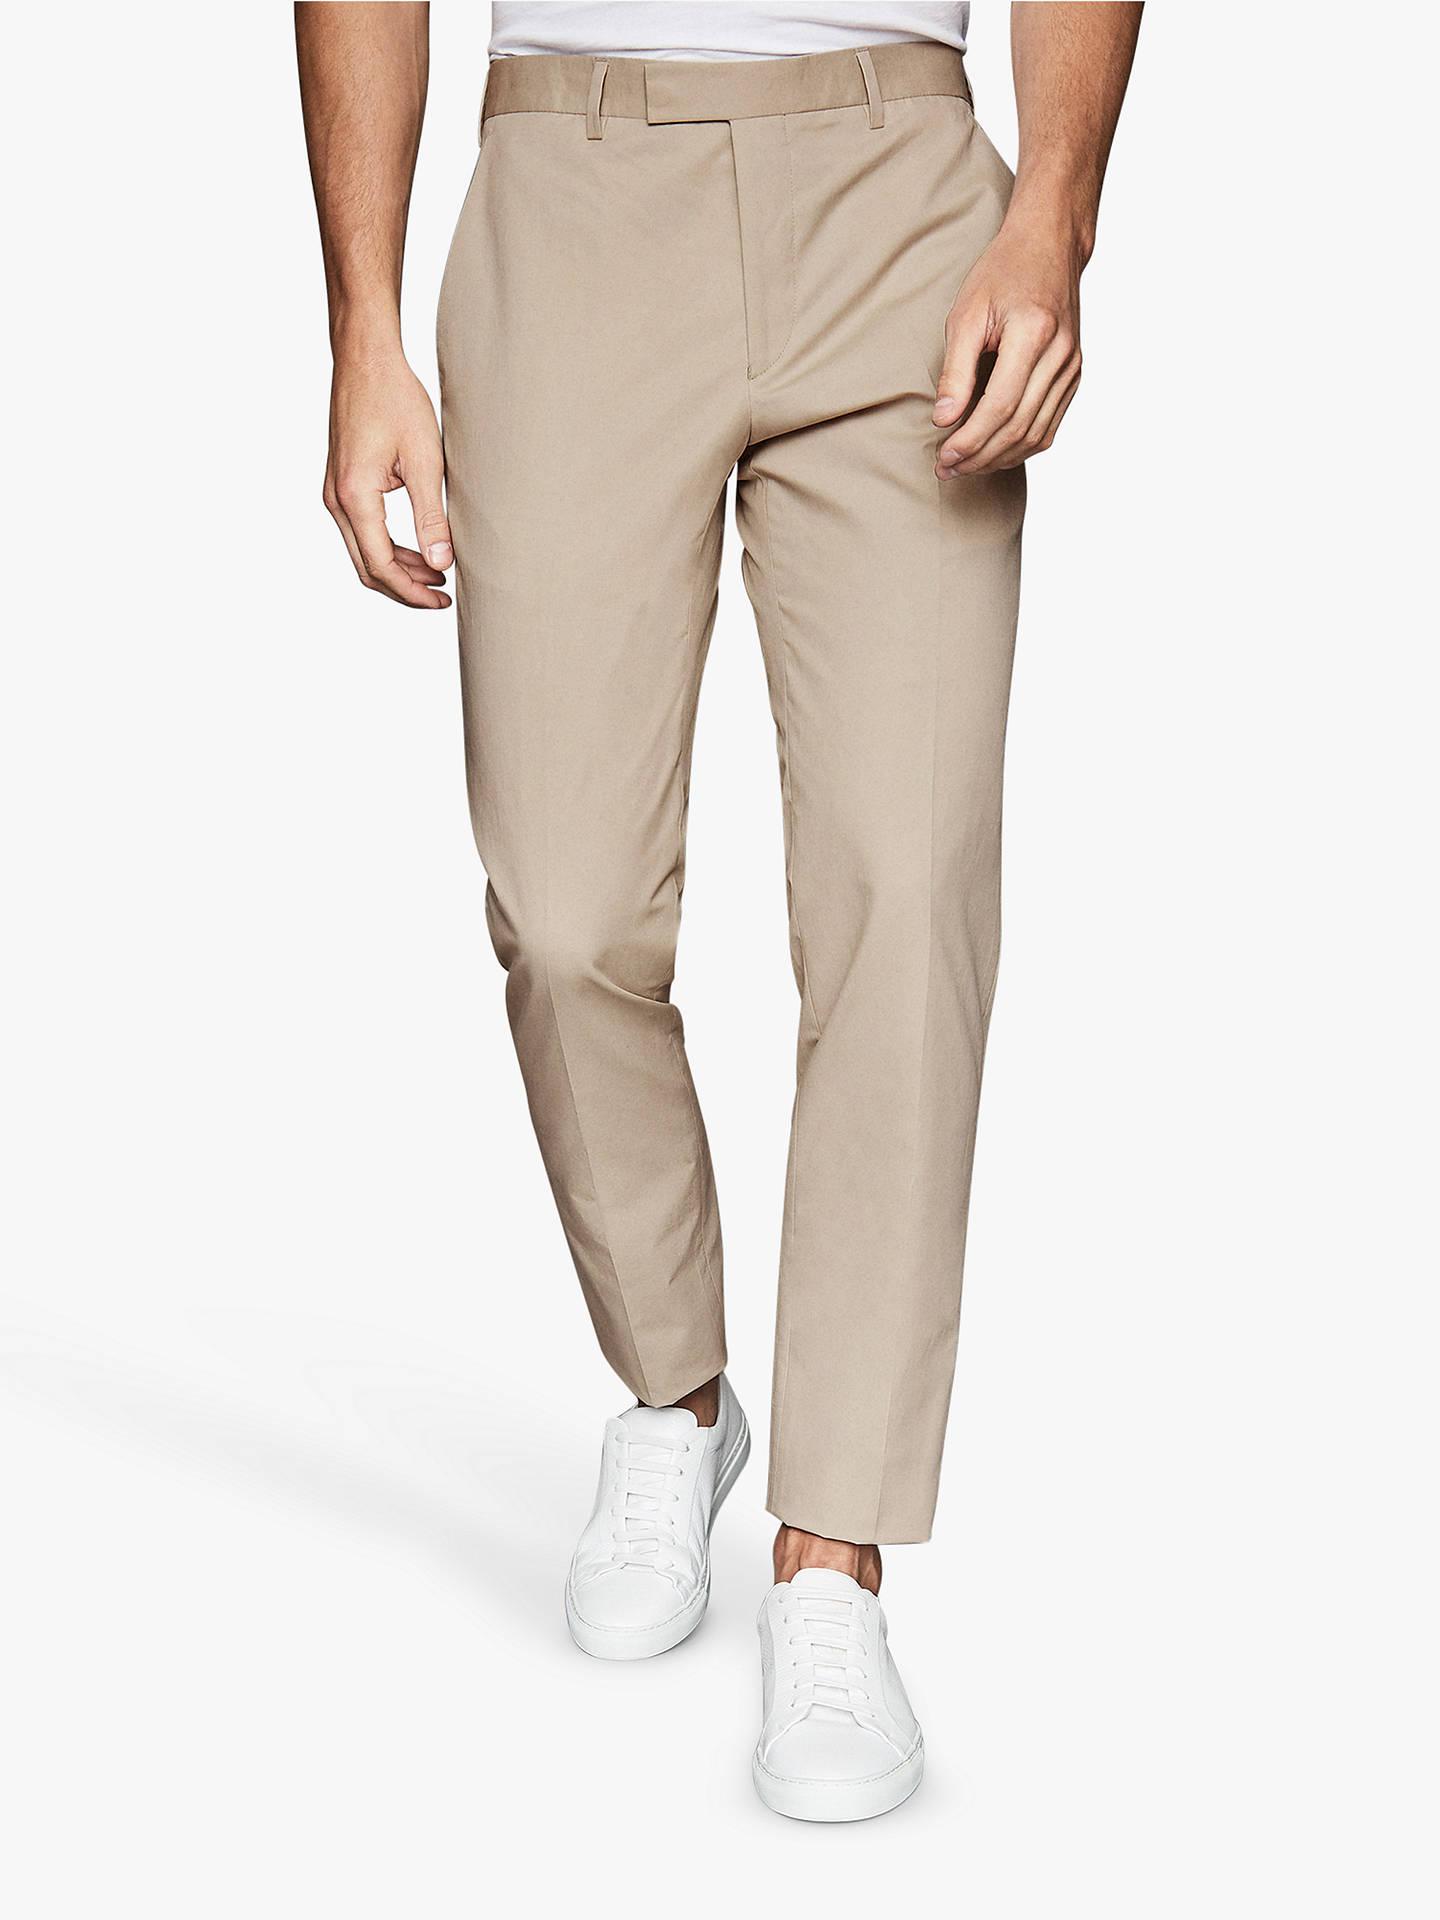 2584f5e6c Buy Reiss Scholar Regular Fit Suit Trousers, Stone, 32R Online at  johnlewis.com ...